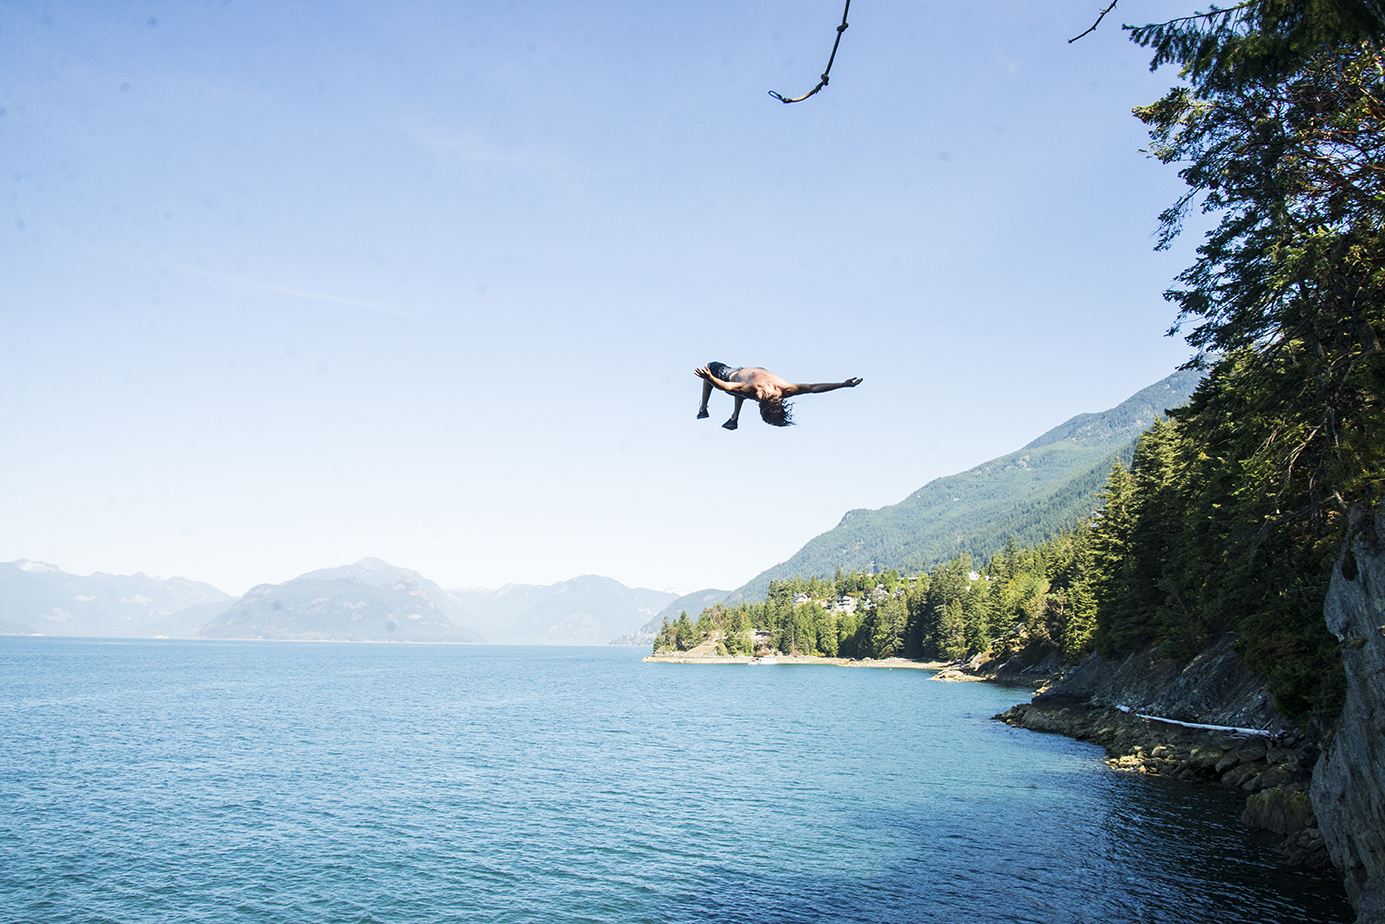 Stay Wild: Vancouver Swimmin' Club